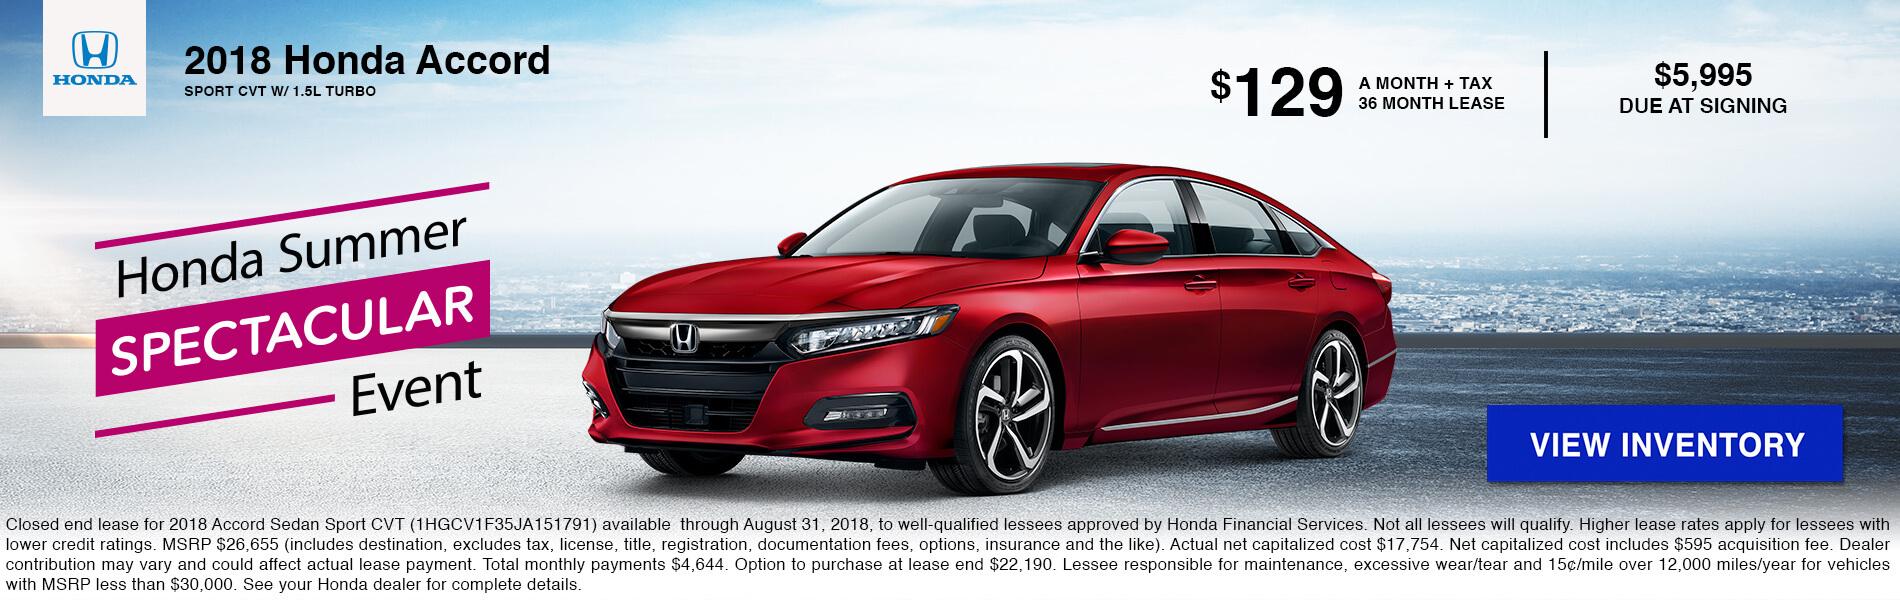 Accord Sedan Lease $129